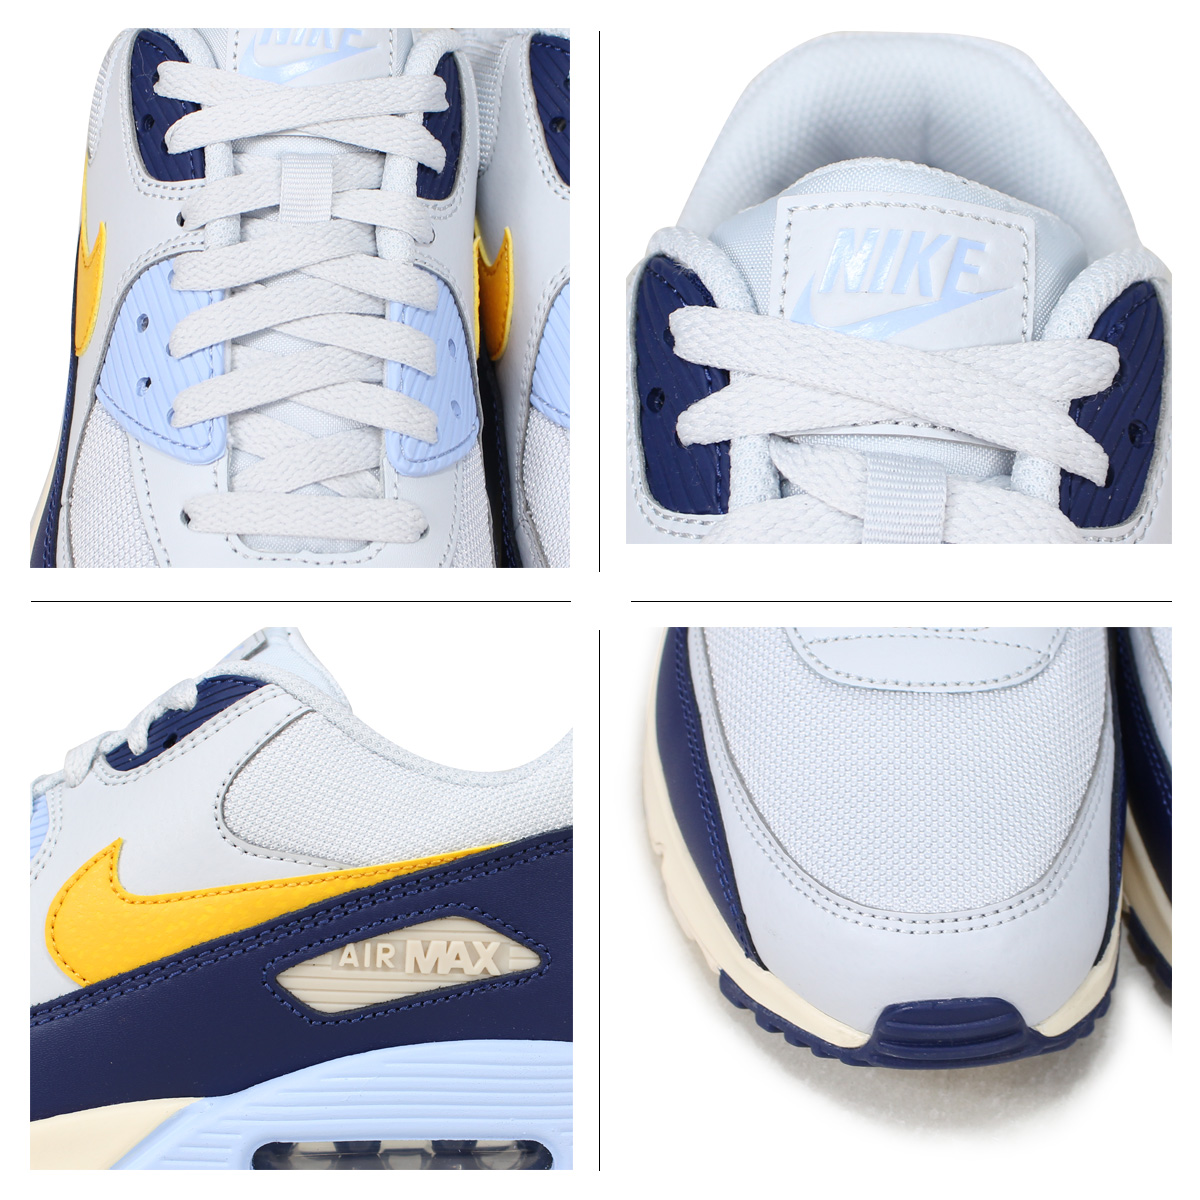 Nike Air Max 90 Essential AJ1285 008